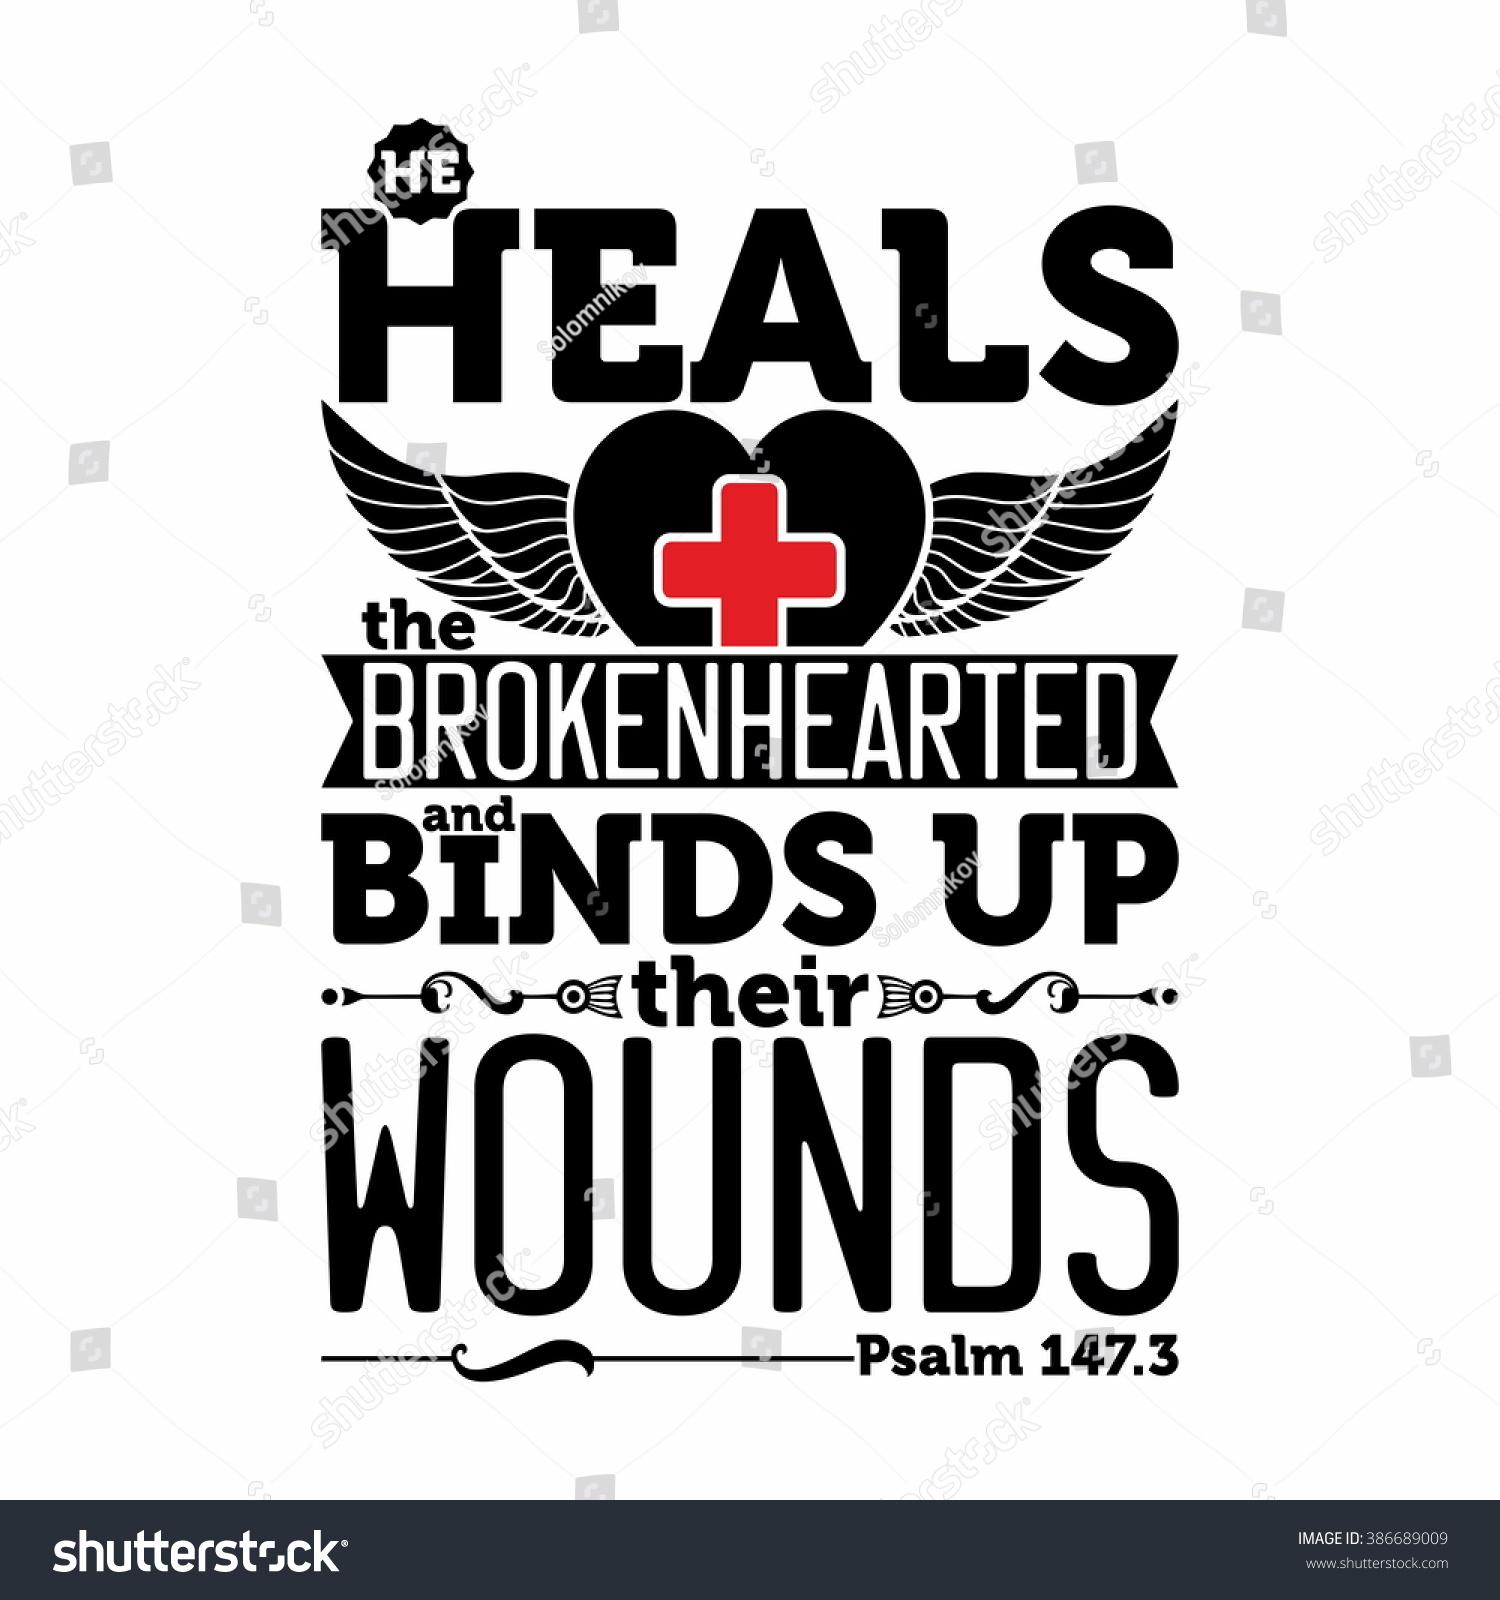 Biblical Illustration He Heals Brokenhearted Binds Stock